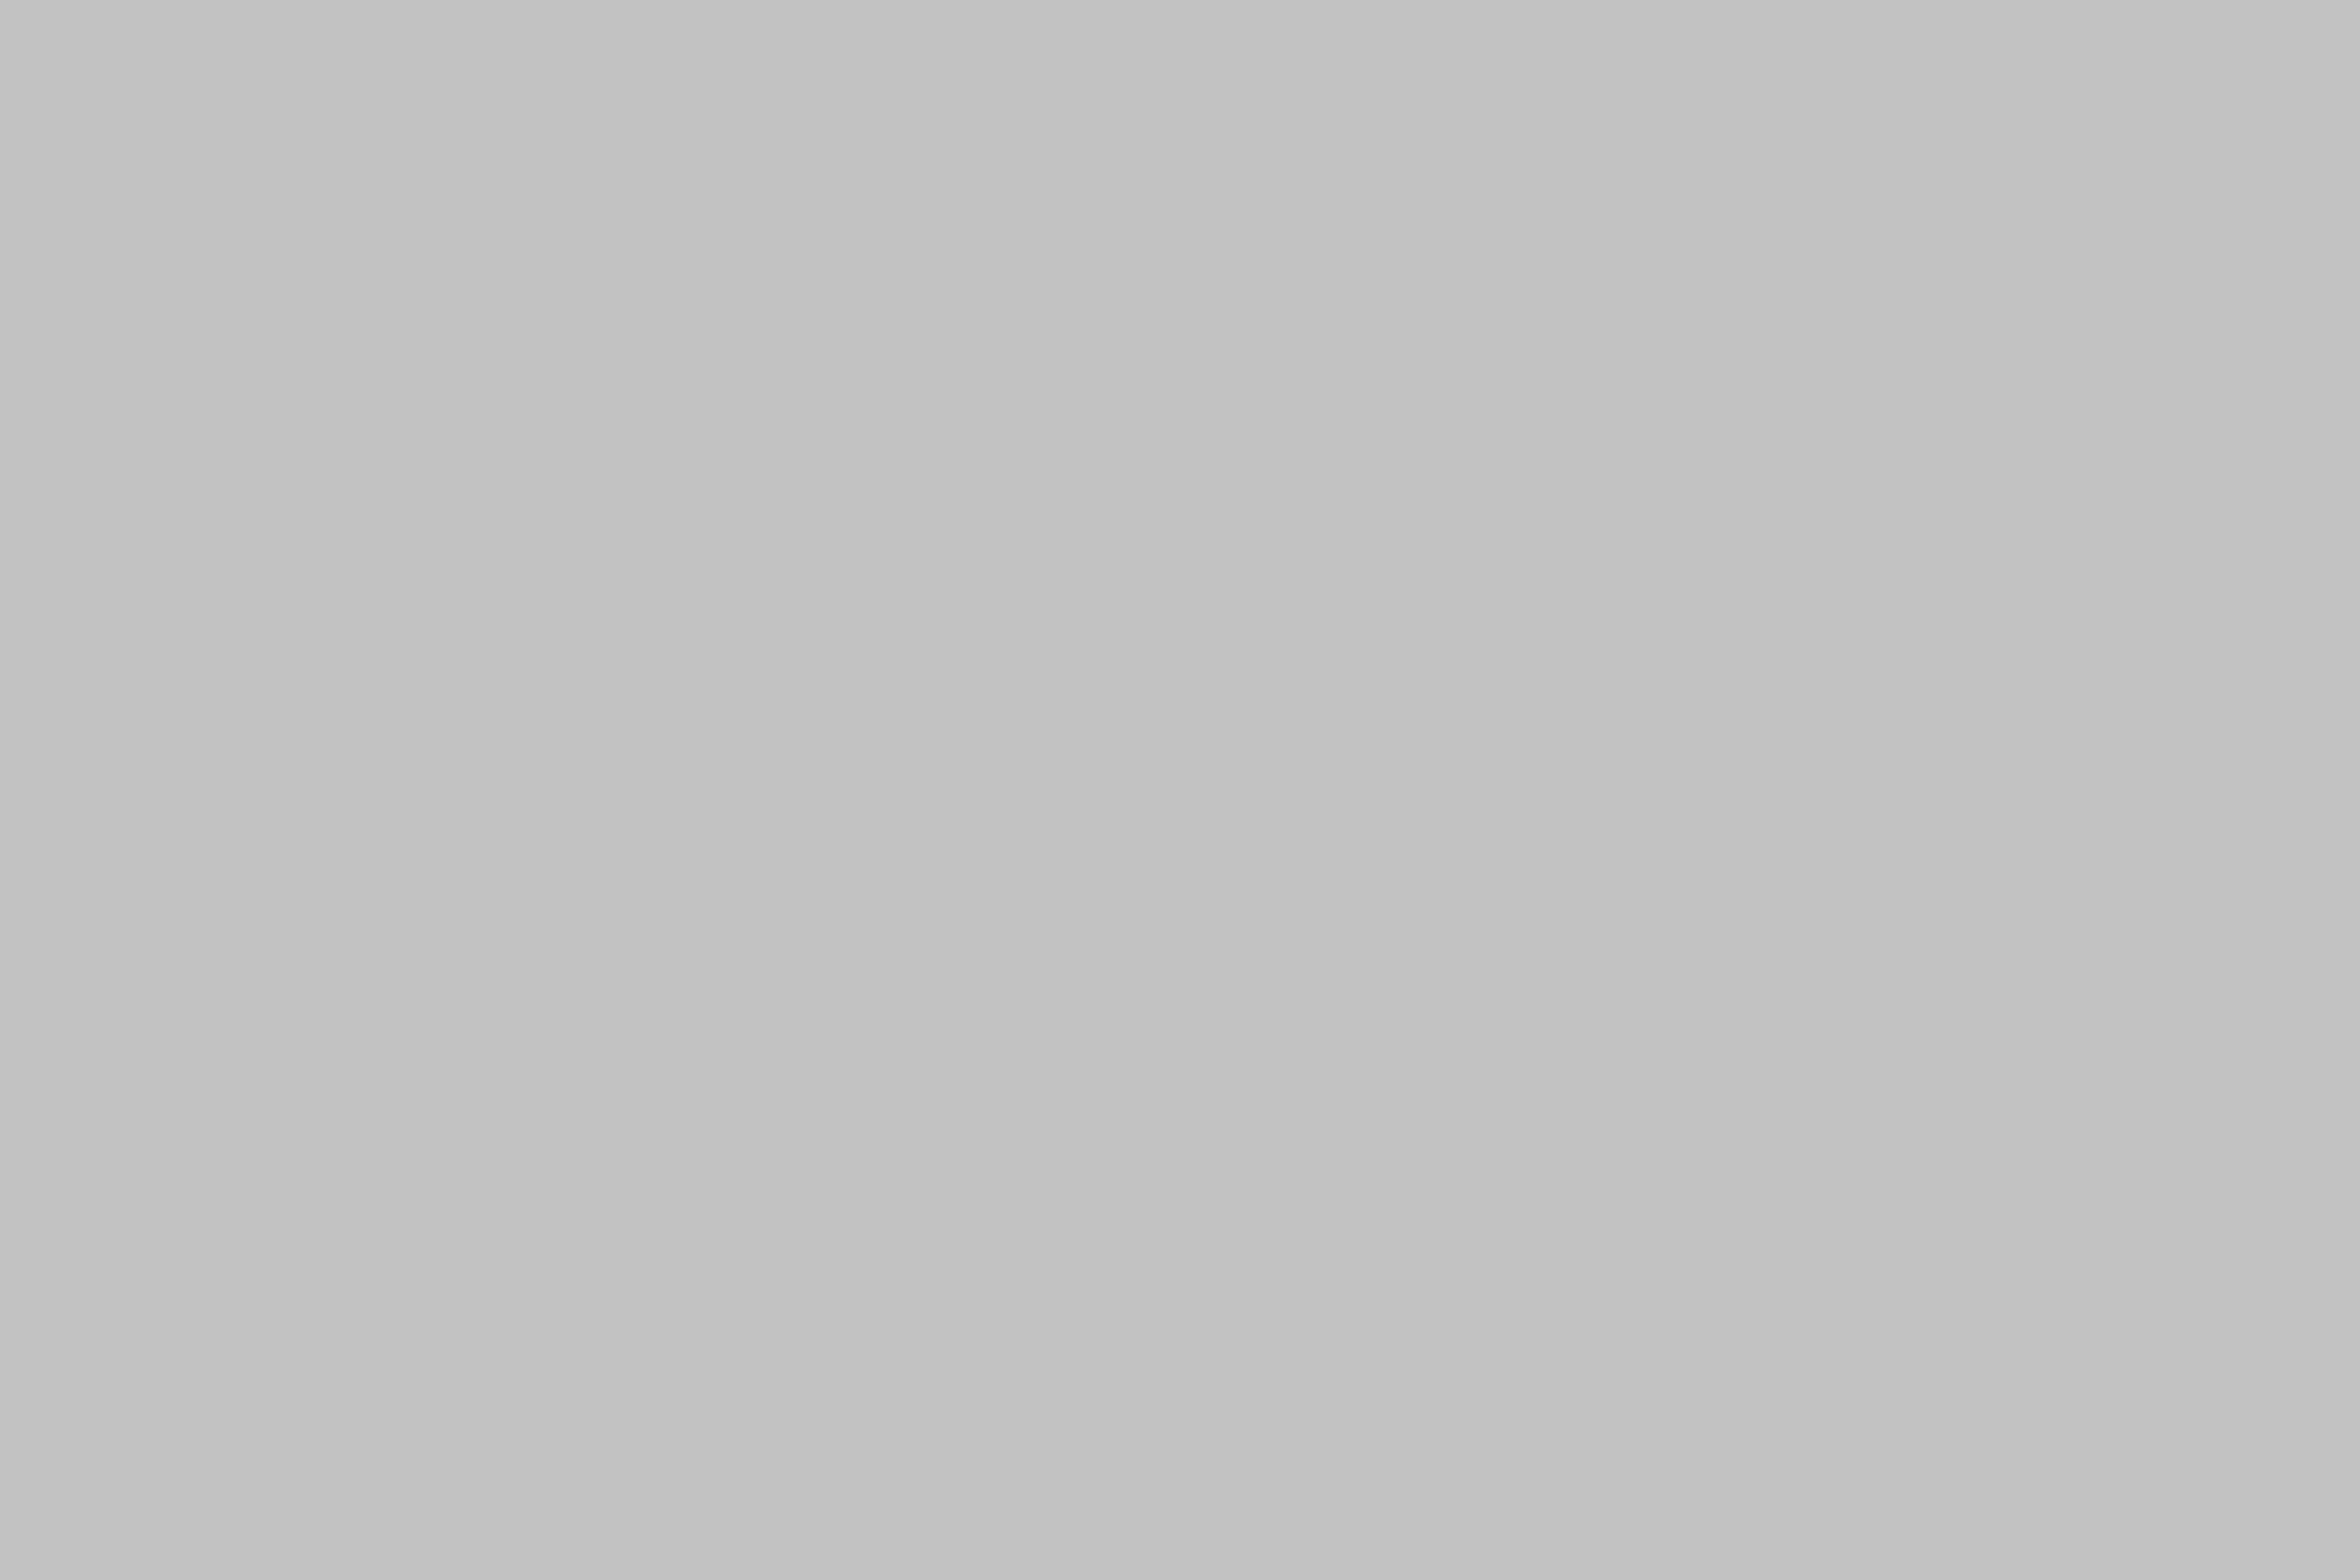 SquareSpace-SermonSeries copy 7.jpg